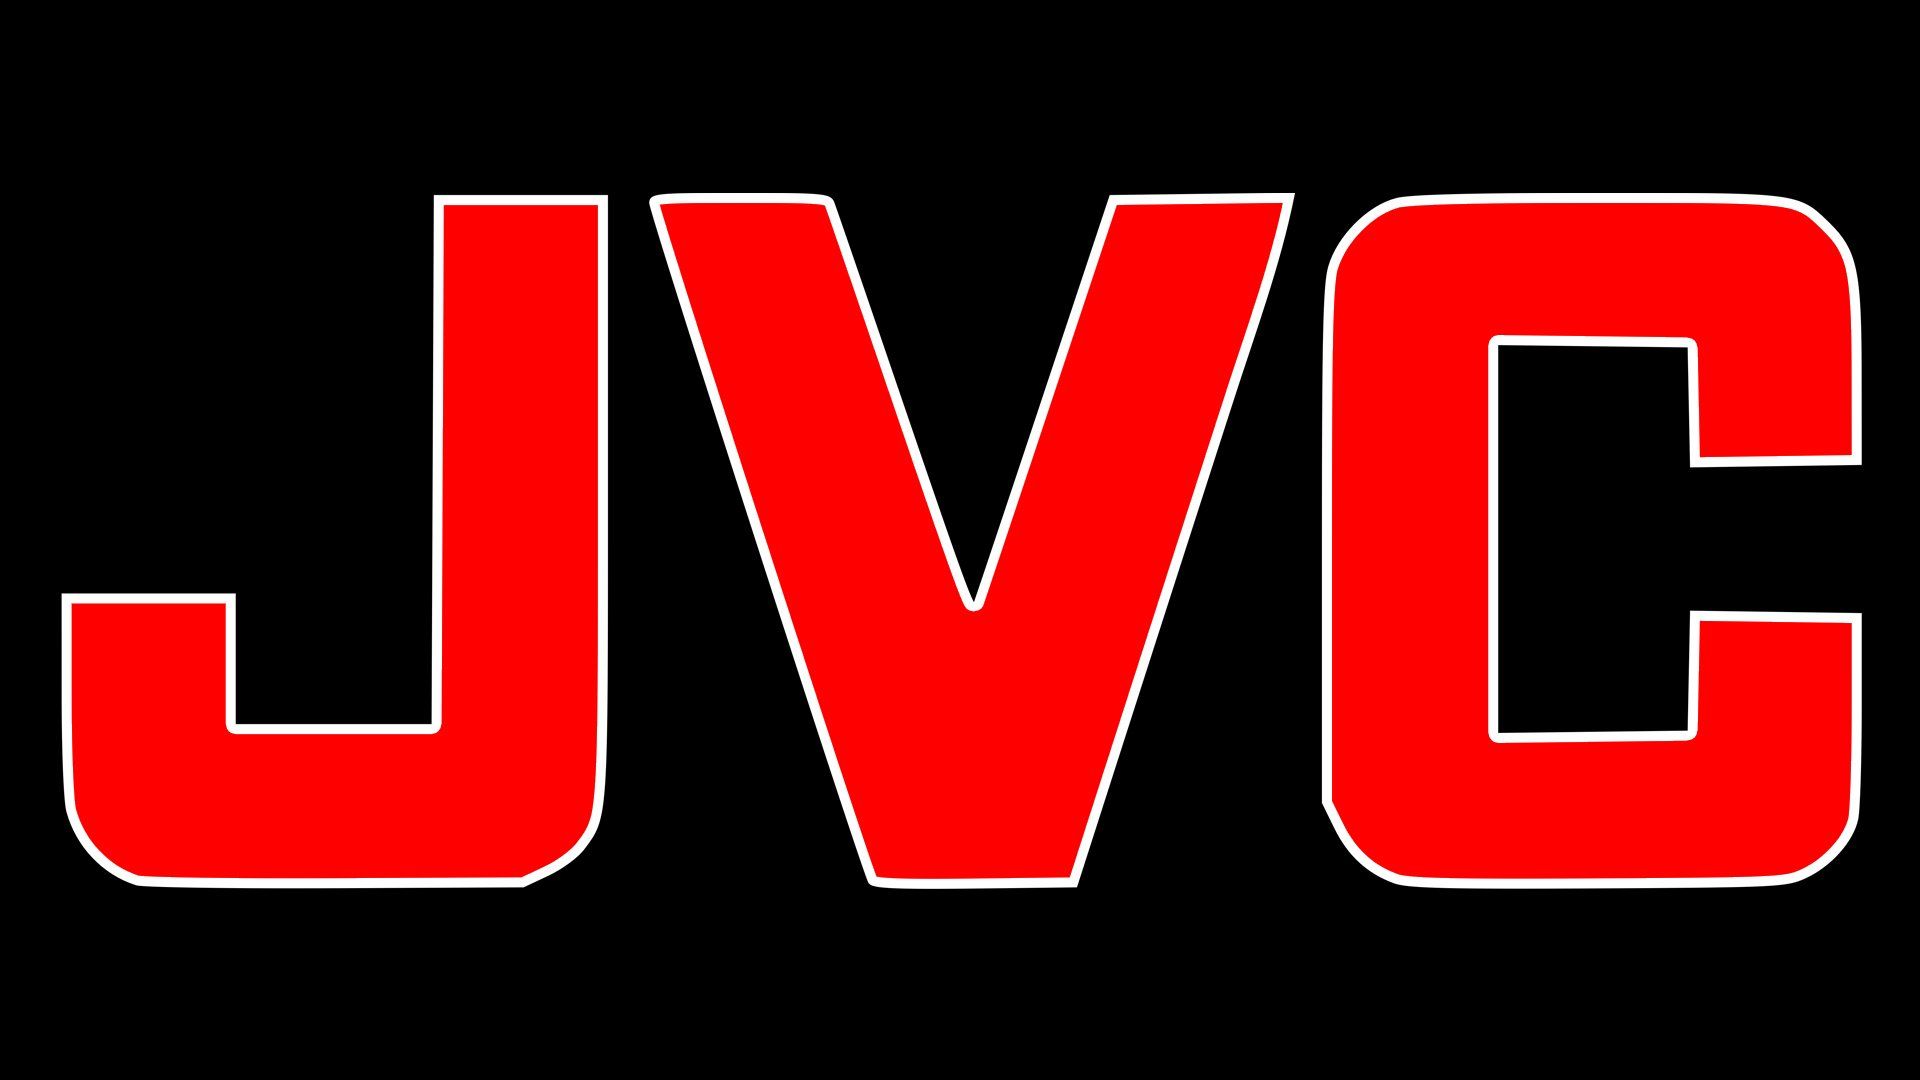 First Car Under 1000 >> JVC Logo, JVC Symbol, Meaning, History and Evolution